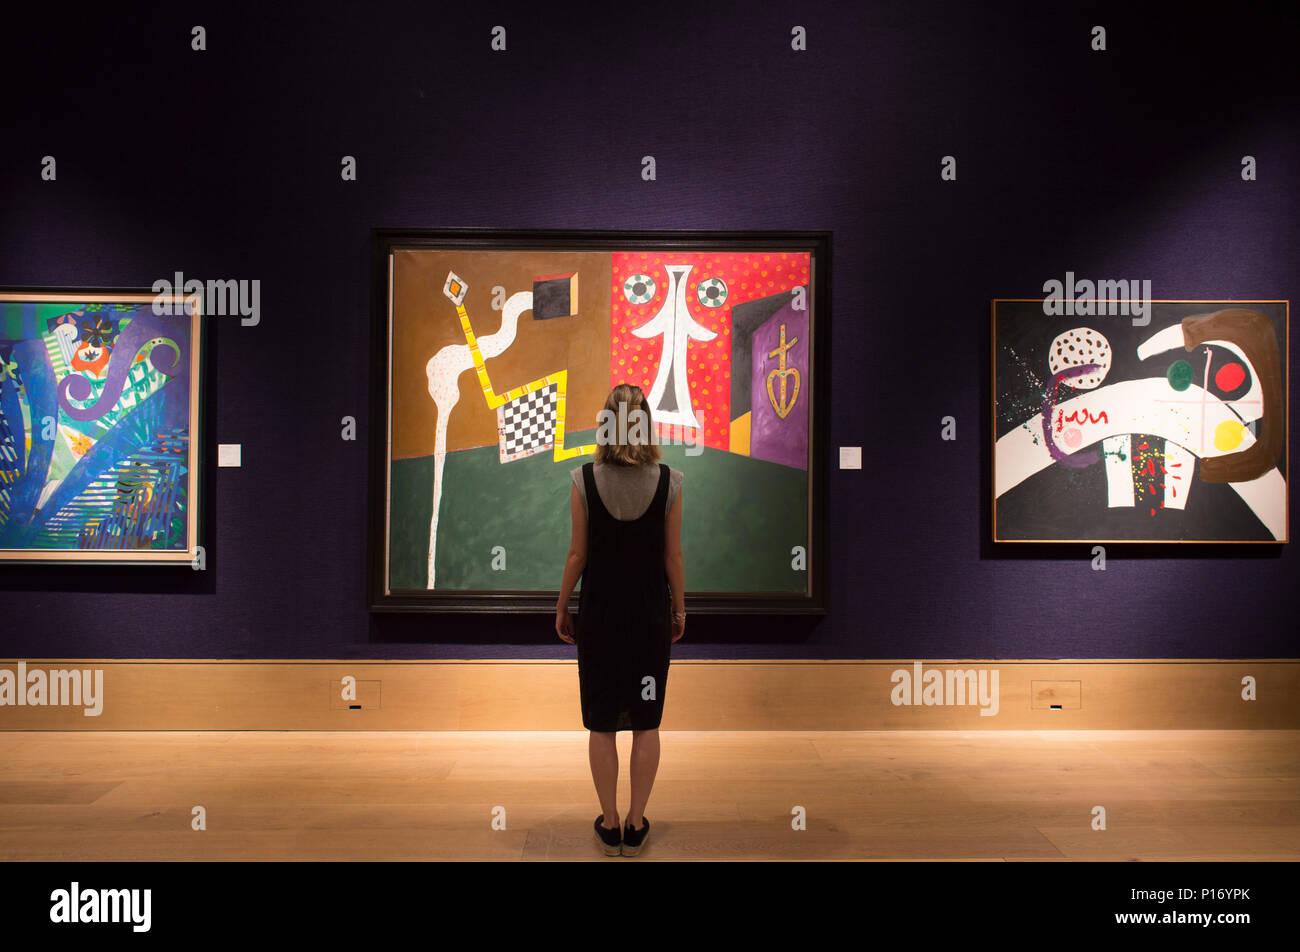 Bonhams, New Bond Street, London, UK. 11 June, 2018. Contemporary works on display at Bonhams Modern British and Irish Art Sale in London. Posed with member of Bonhams press staff. Credit: Malcolm Park/Alamy Live News. - Stock Image